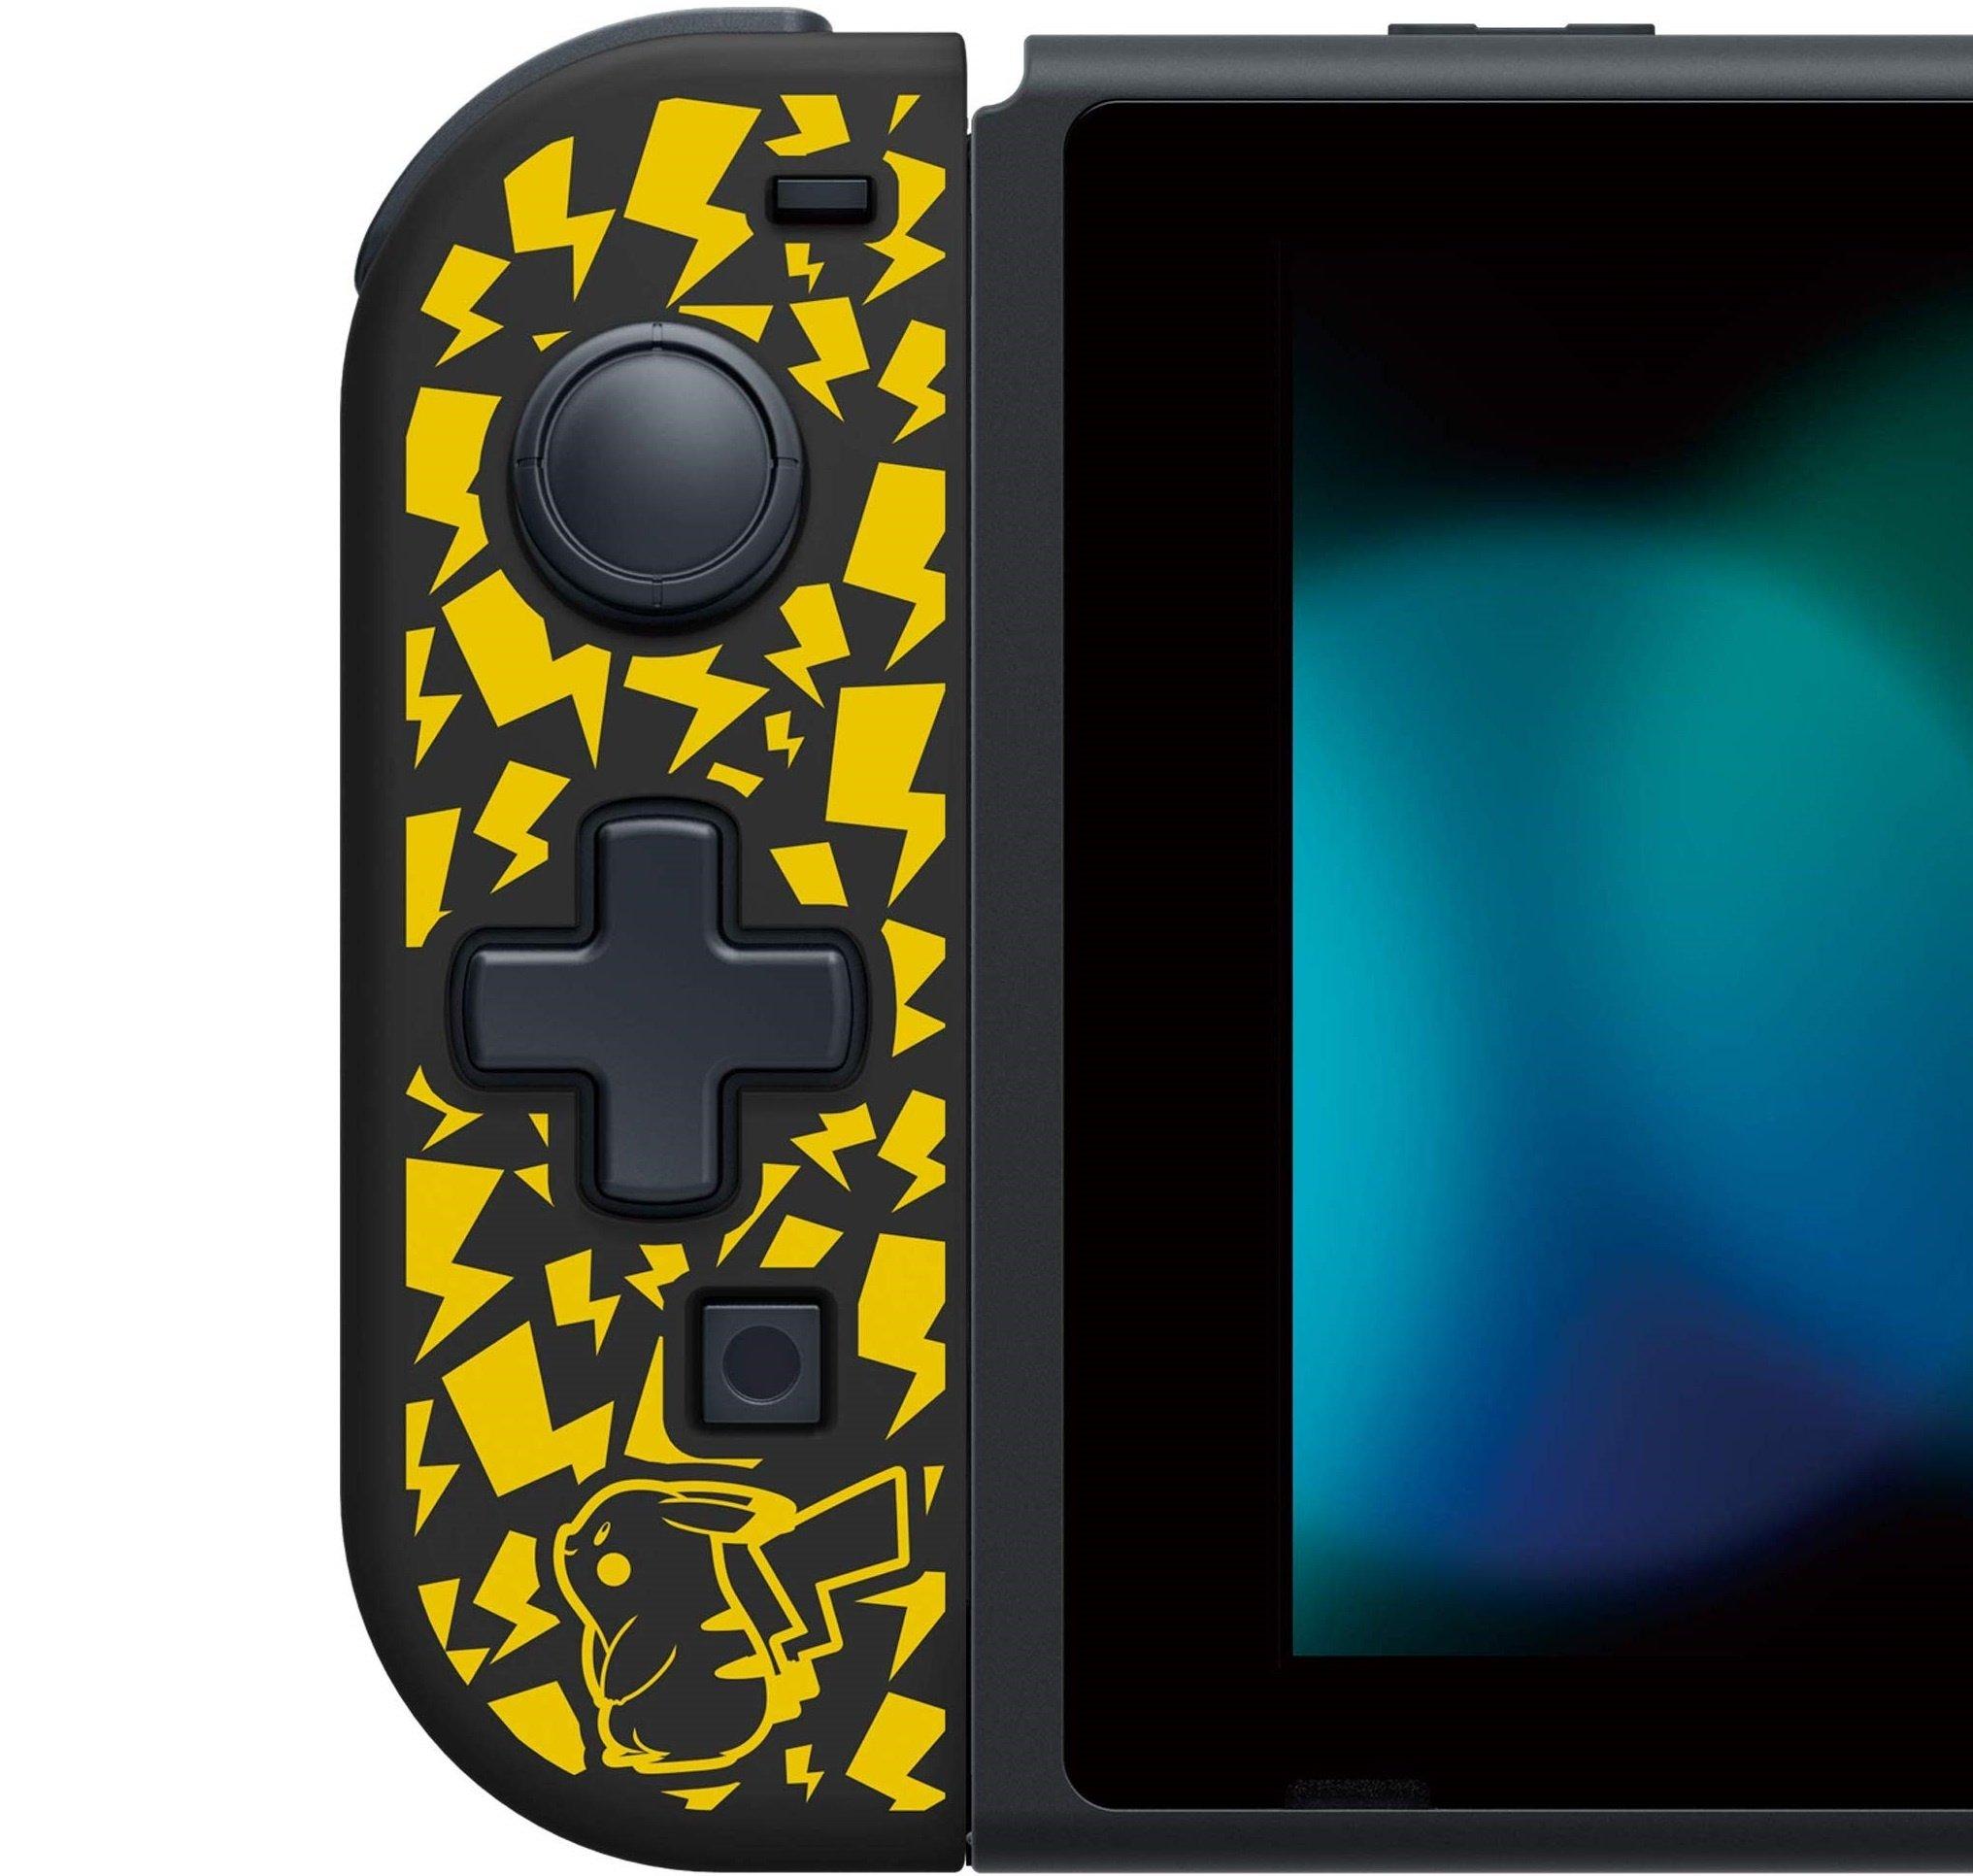 ef715440c1b Hori Releasing Pikachu Themed D-Pad Joy-Con On 16th November ...